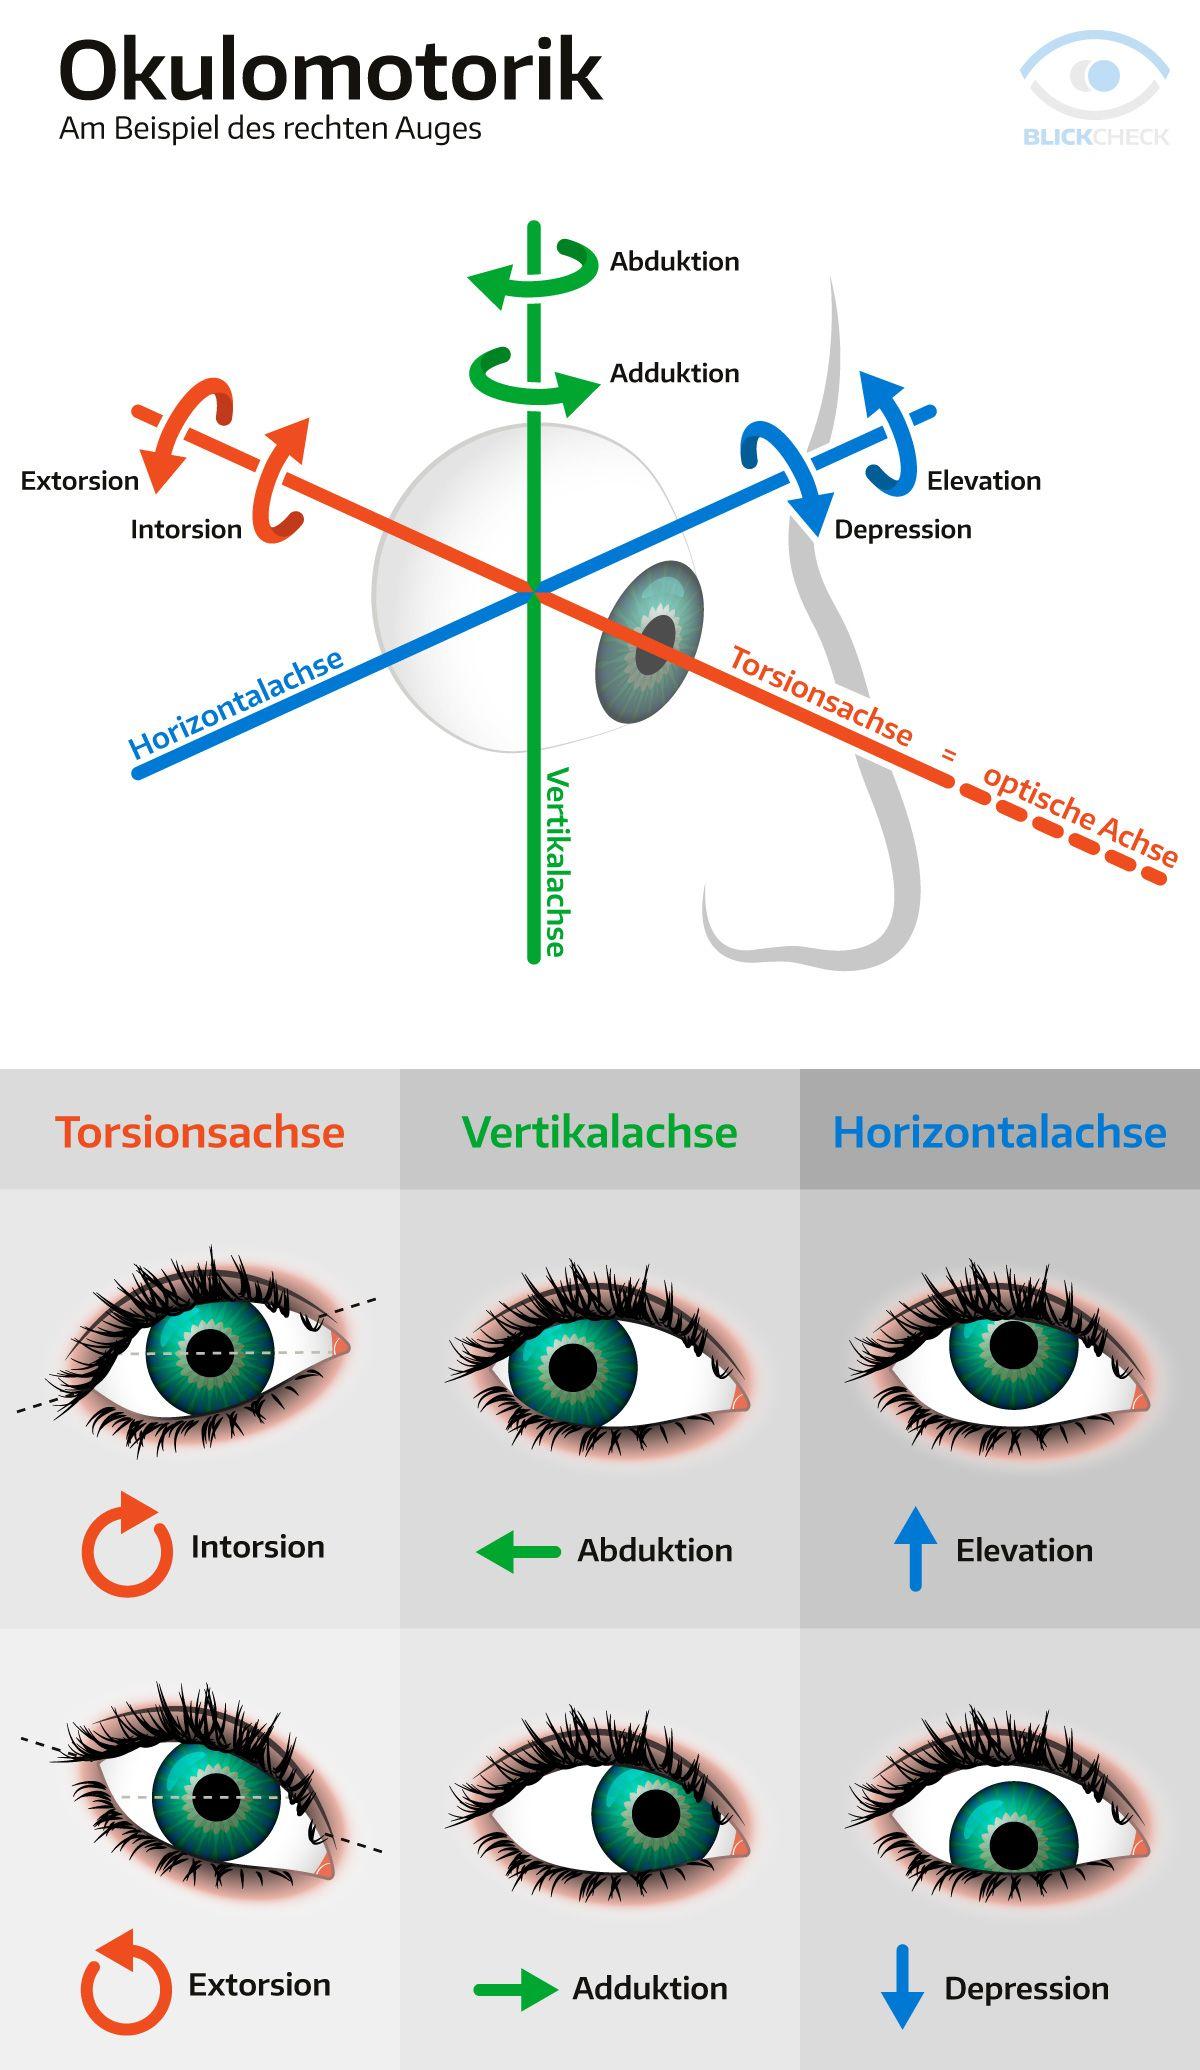 Okulomotorik (Augenbewegung) am Beipiel des rechten Auges ...